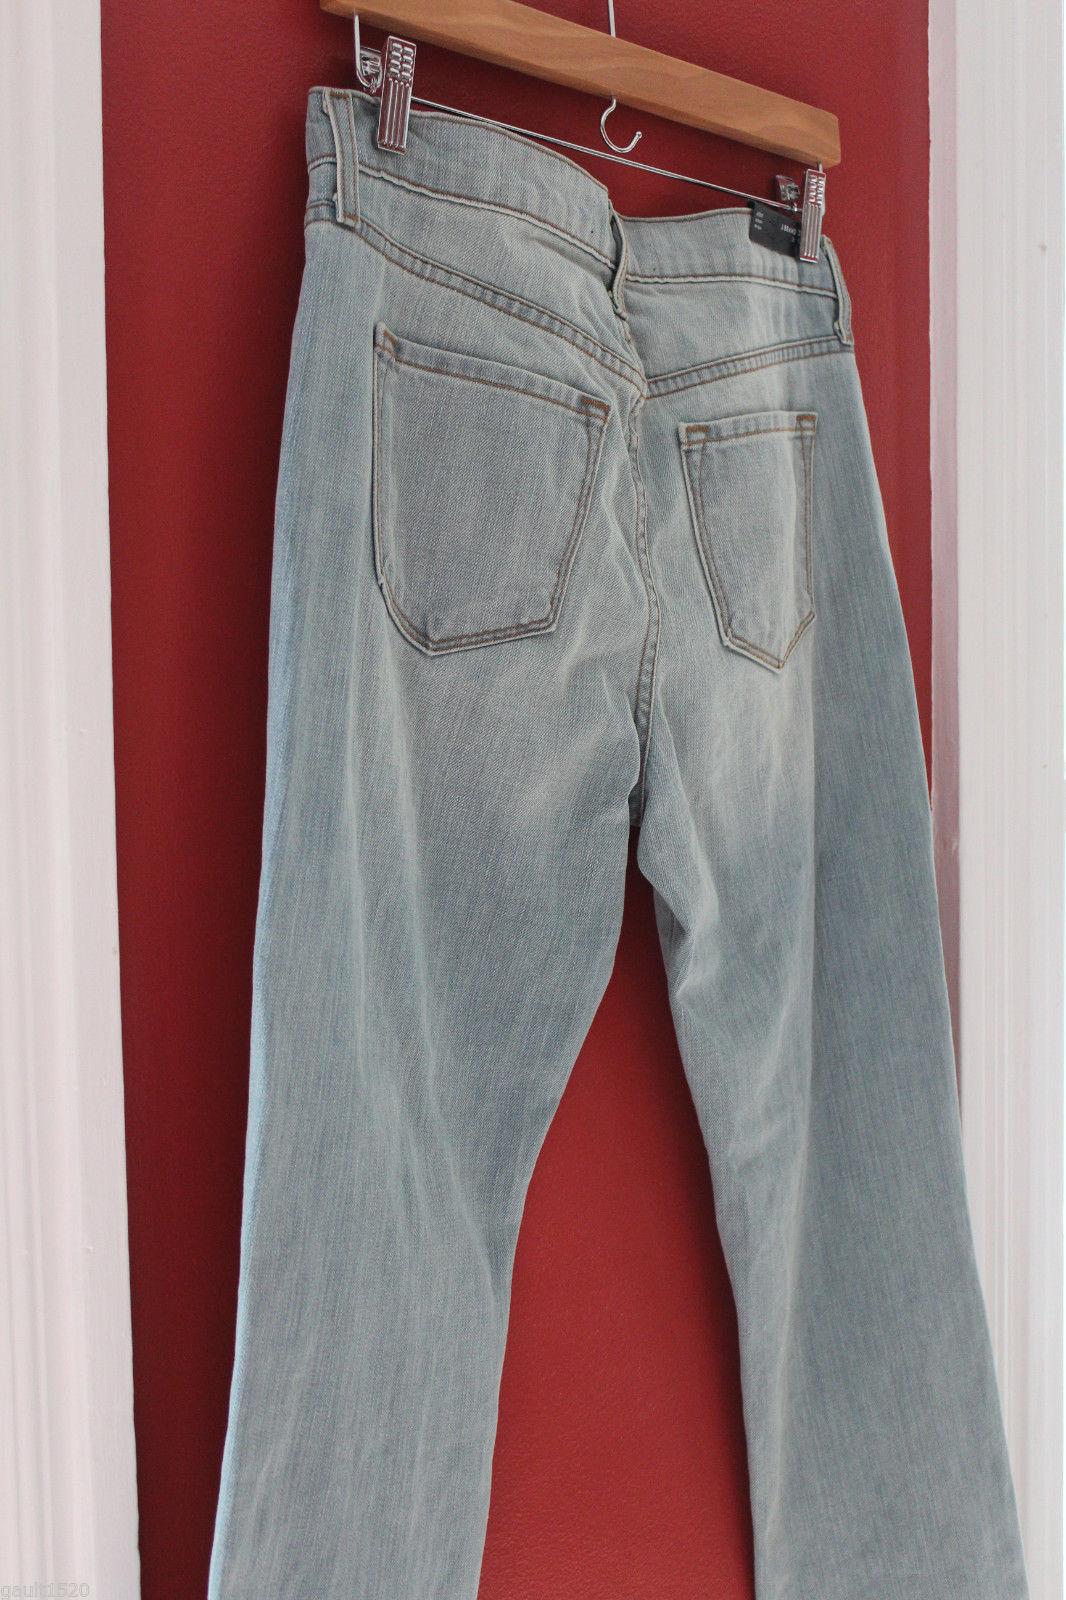 NWT J BRAND Designer Women's Aidan Slouchy Boy Jeans Denim Pants 26 2 $359 image 7